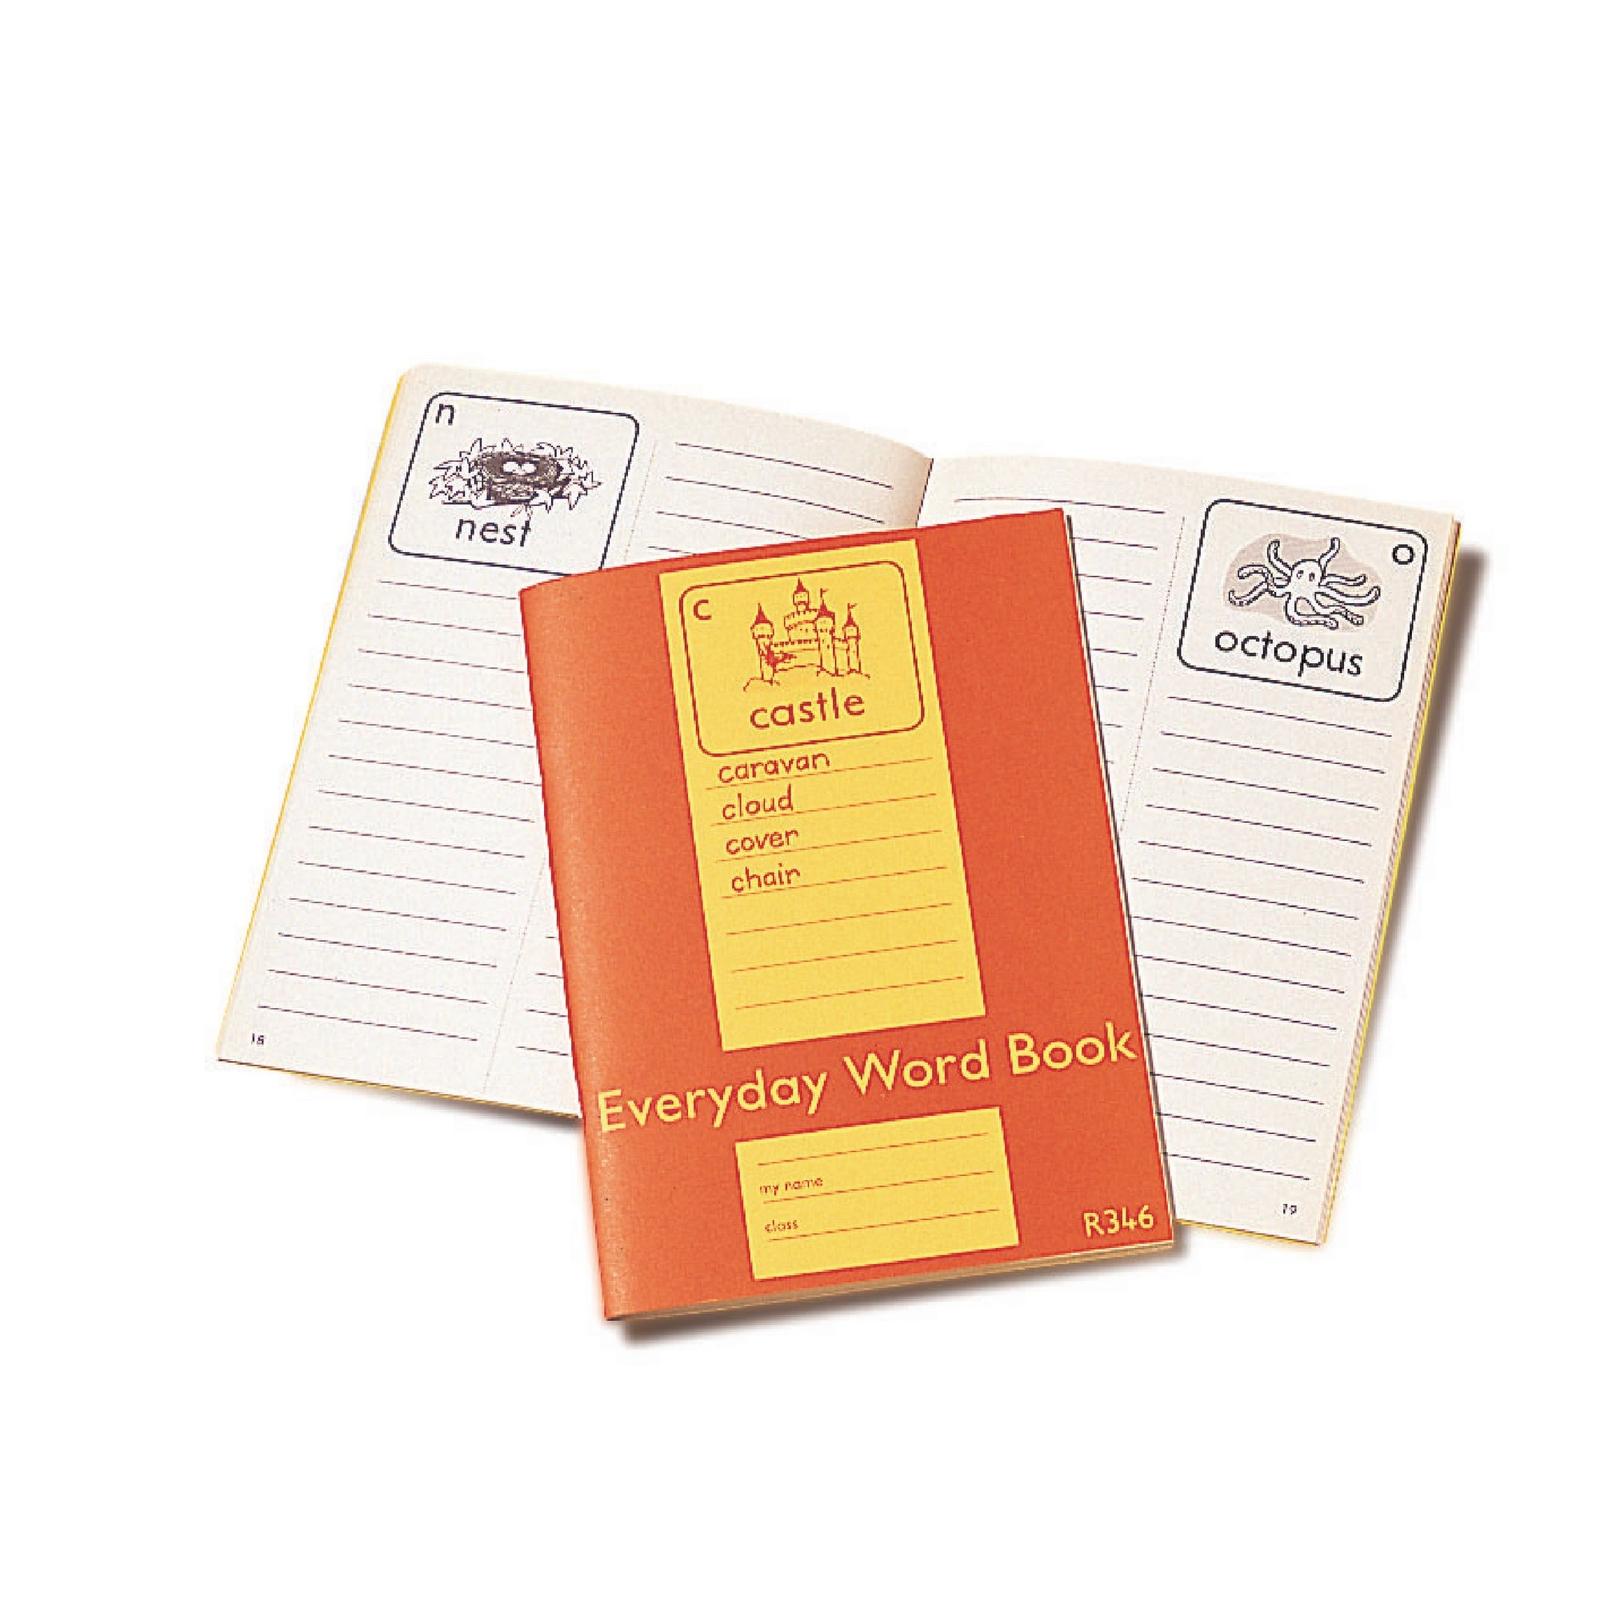 Everyday Word Book